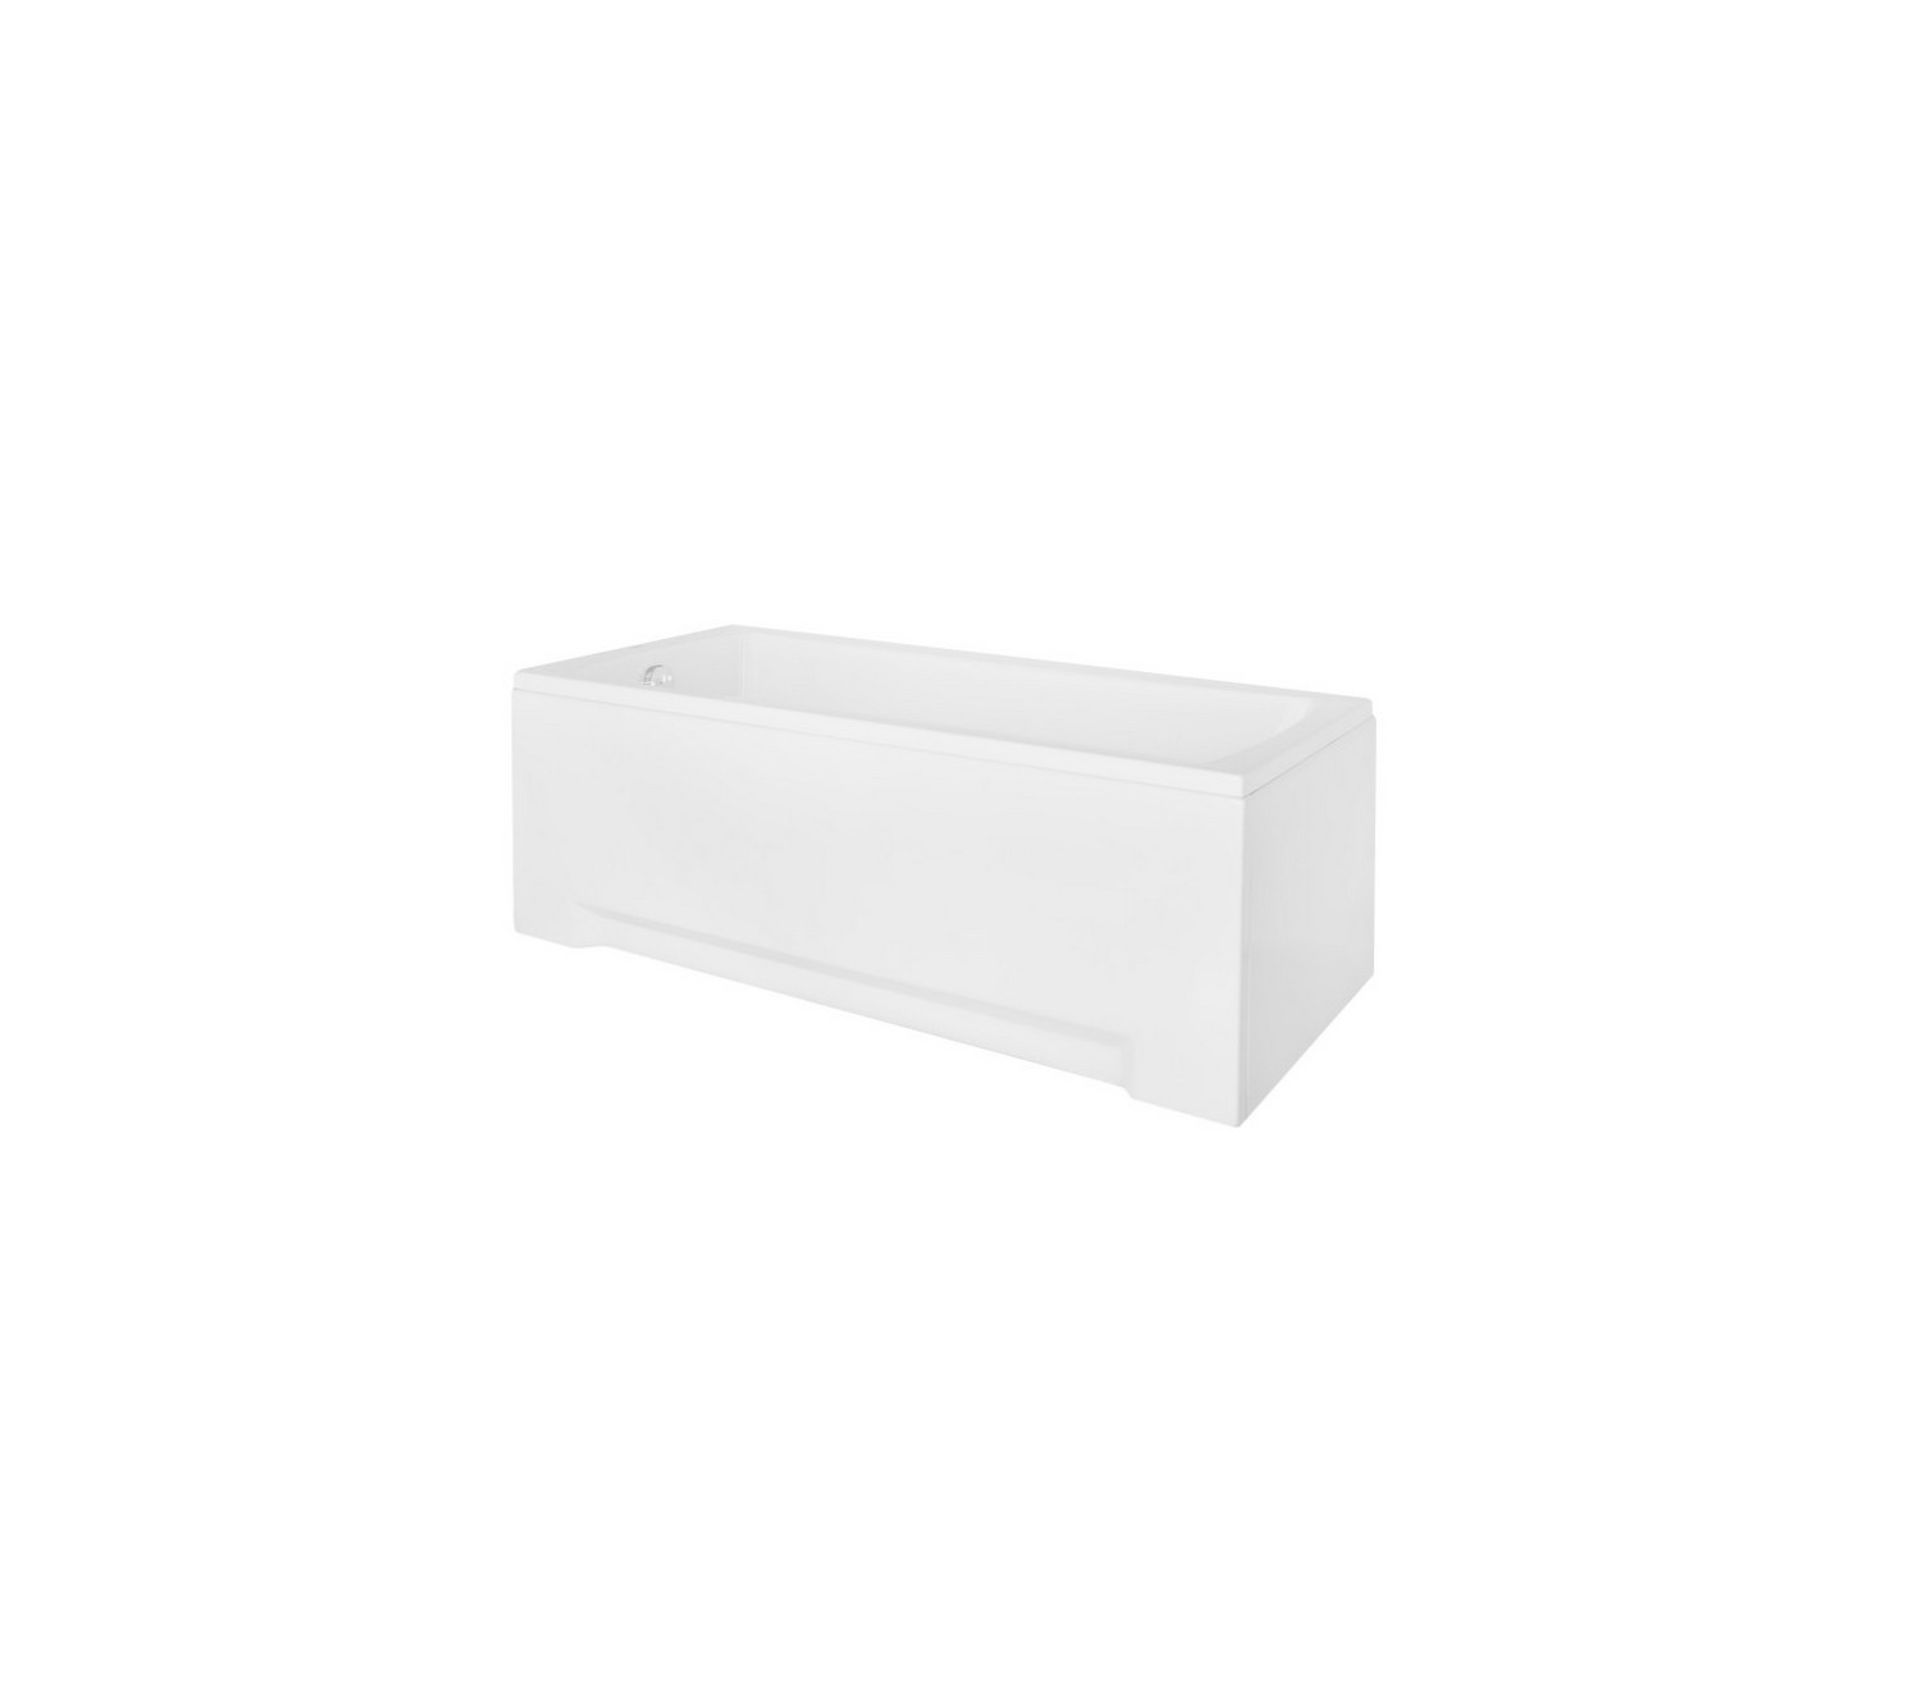 Decoration Tablier De Baignoire baignoire mirano avec tablier 140/150/160/170 x 70 - dimensions: 150 x 70 cm